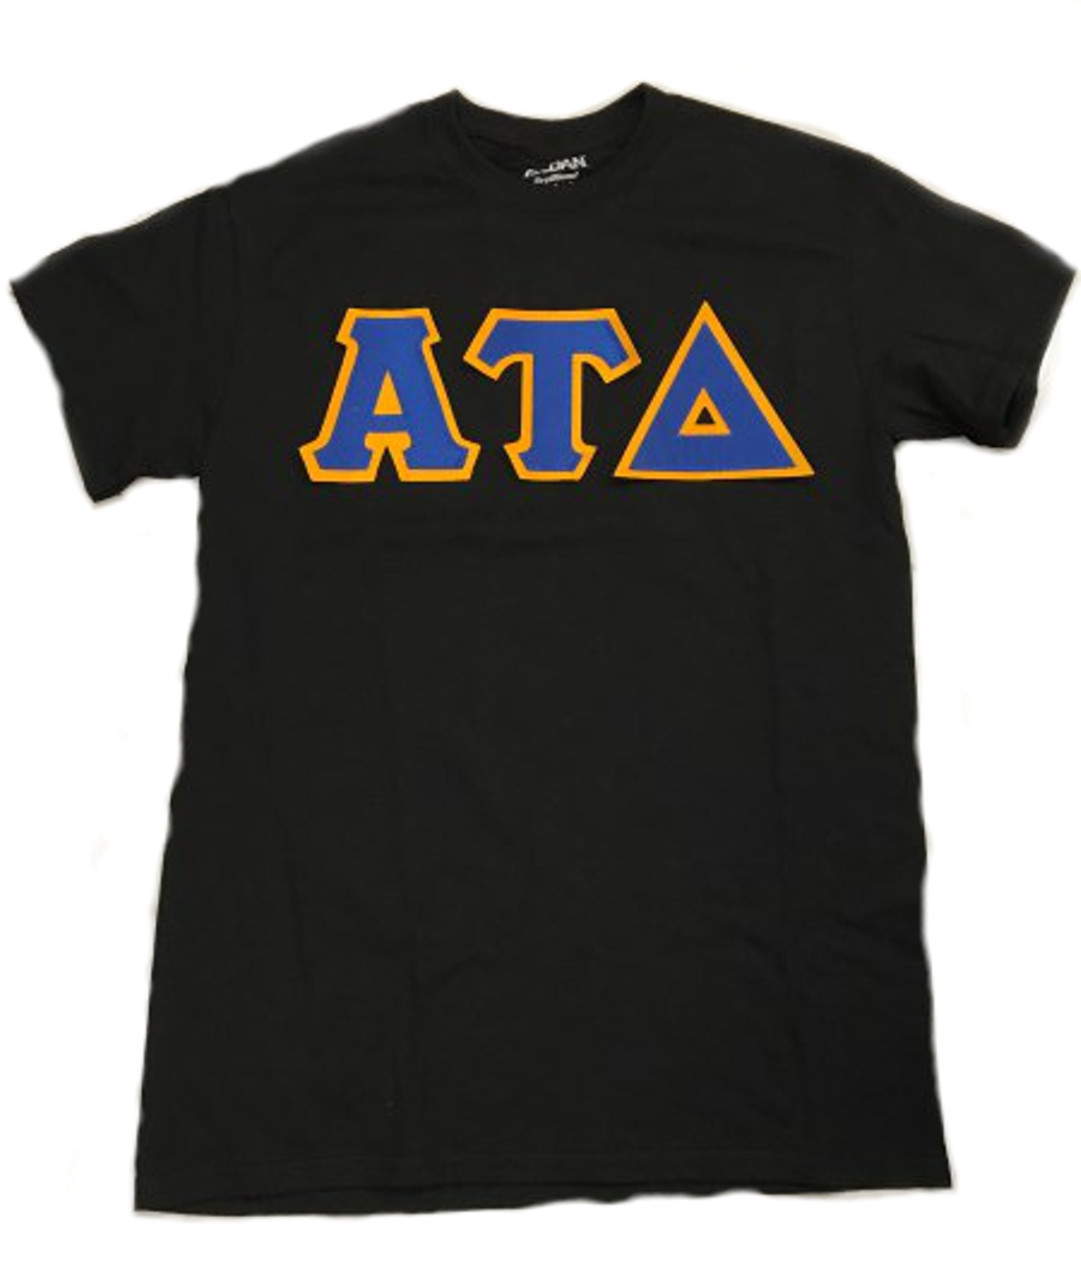 4f2ddcc4 Classic Solid Color Twill Greek Letter Shirt | Greek Shop | S&S ...